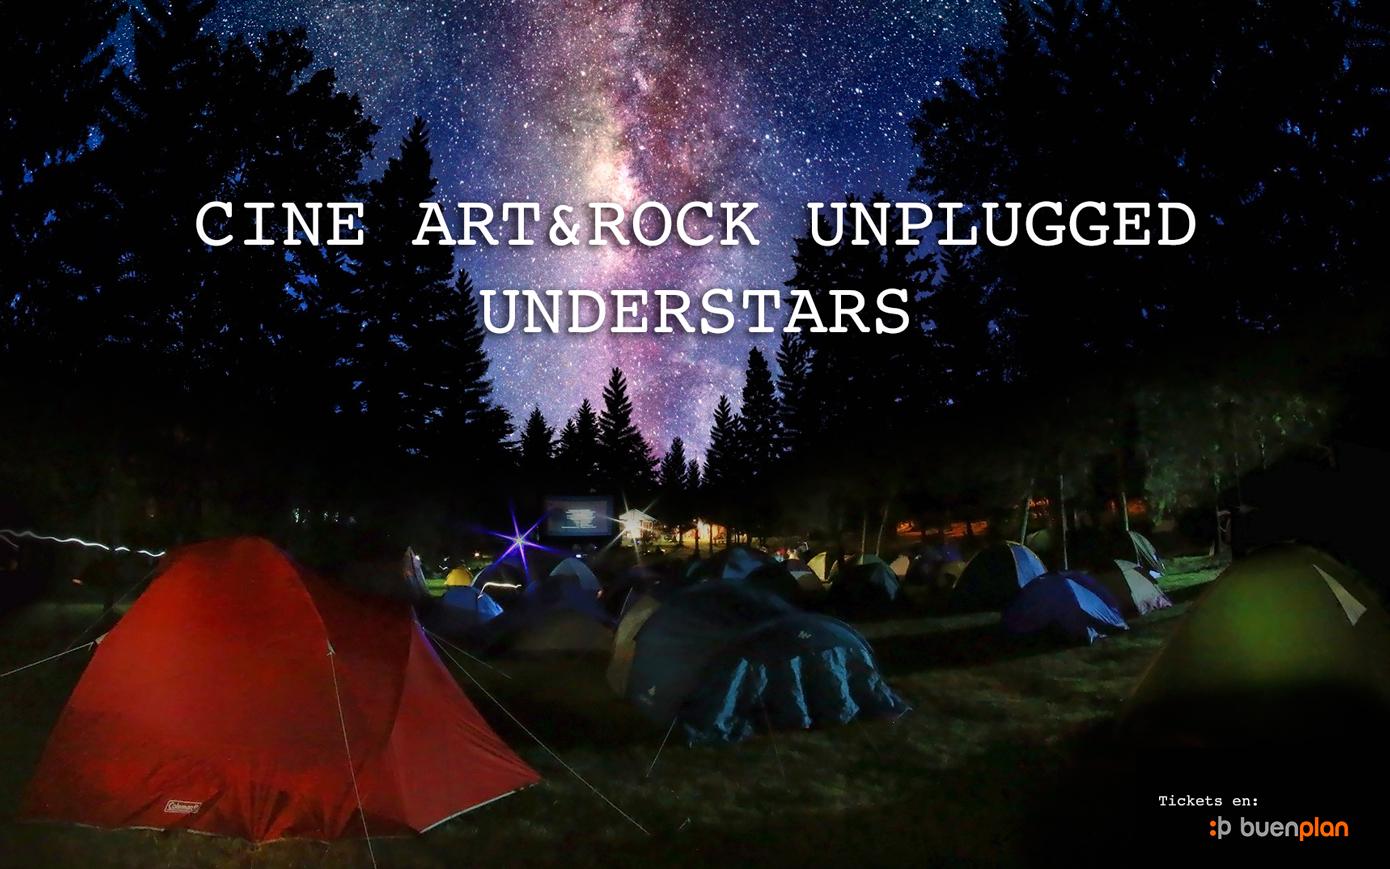 Cine Art&Rock Unplugged UnderStars  en Pintag, BuenPlan